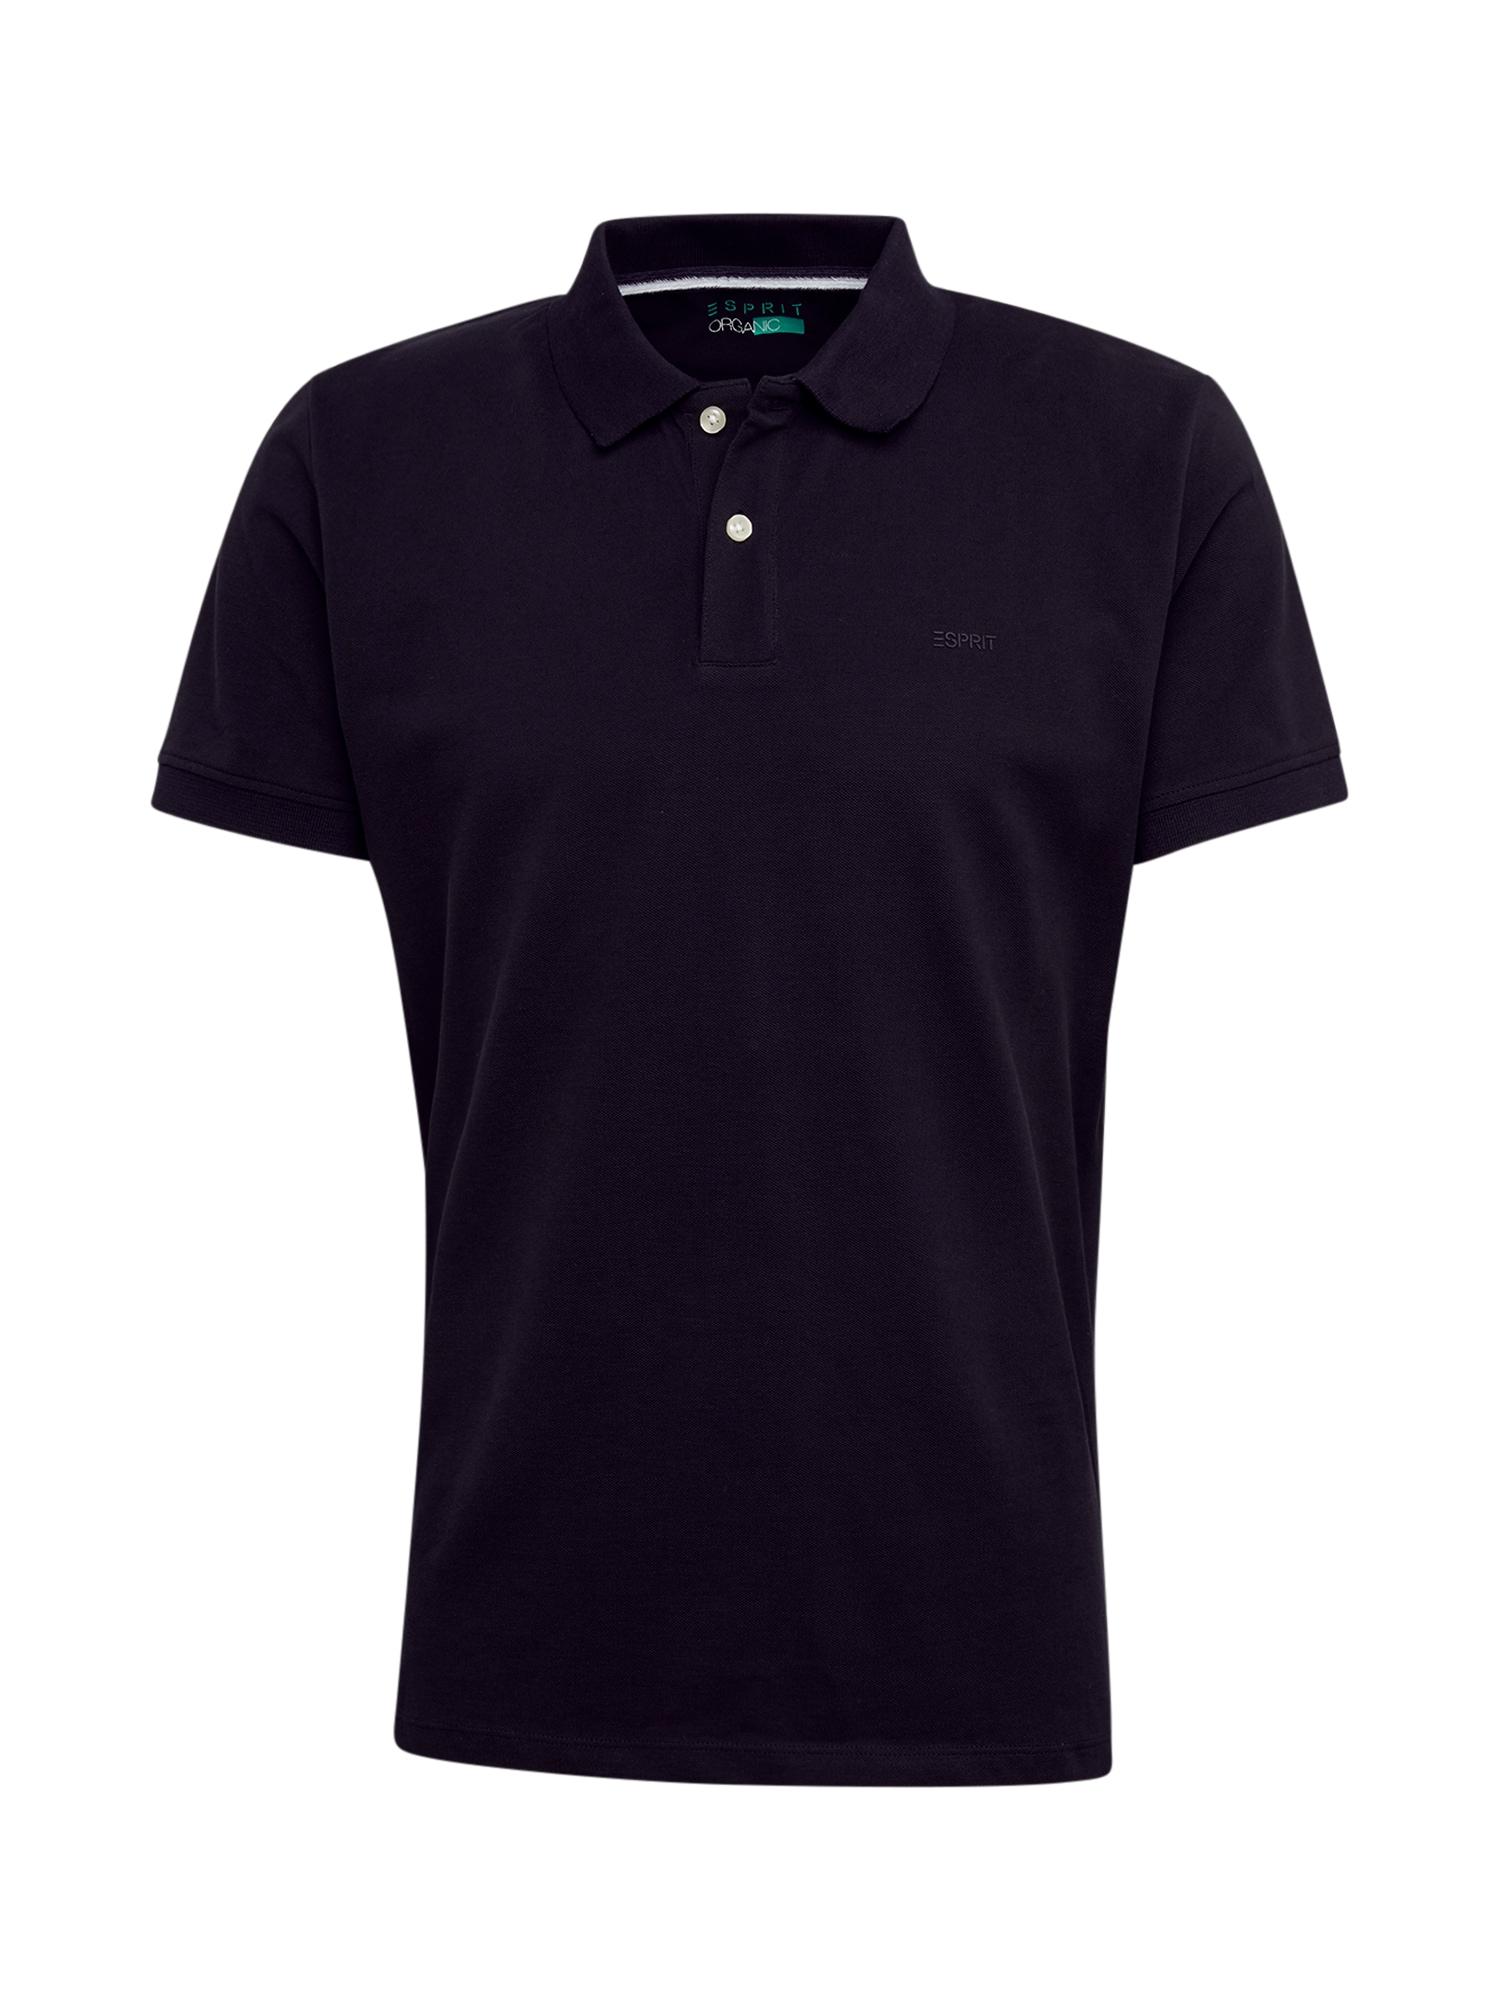 ESPRIT Tričko 'OCS N pi po ss'  čierna